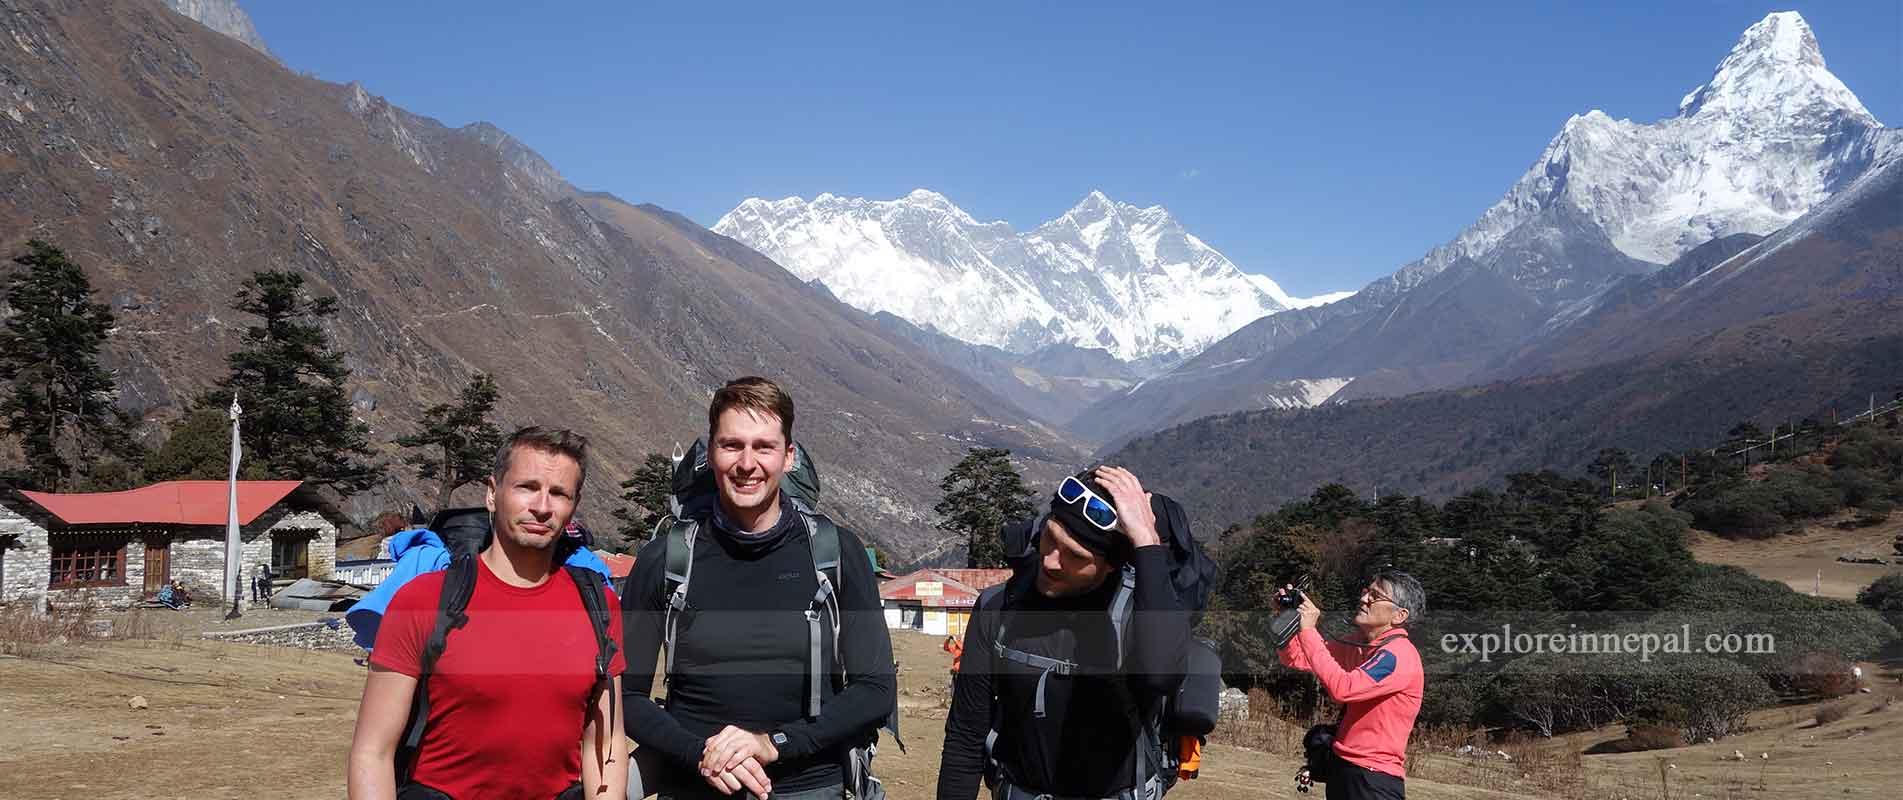 trekking-in-jiri-everest-base-camp